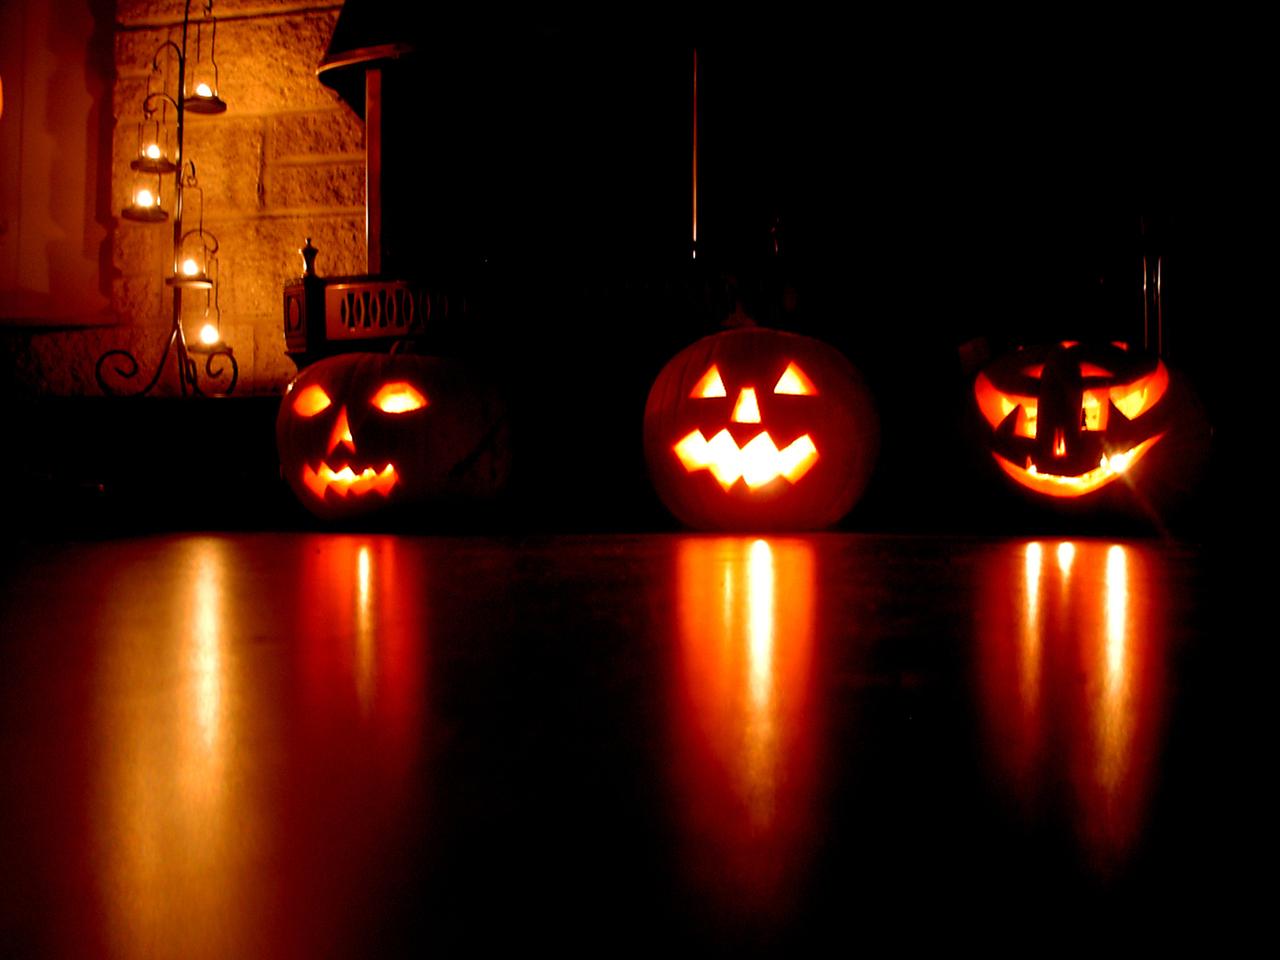 halloween lighting effects machine. 6-mystical-halloween-lighting-ideas 12 Halloween Lighting Effects Machine B